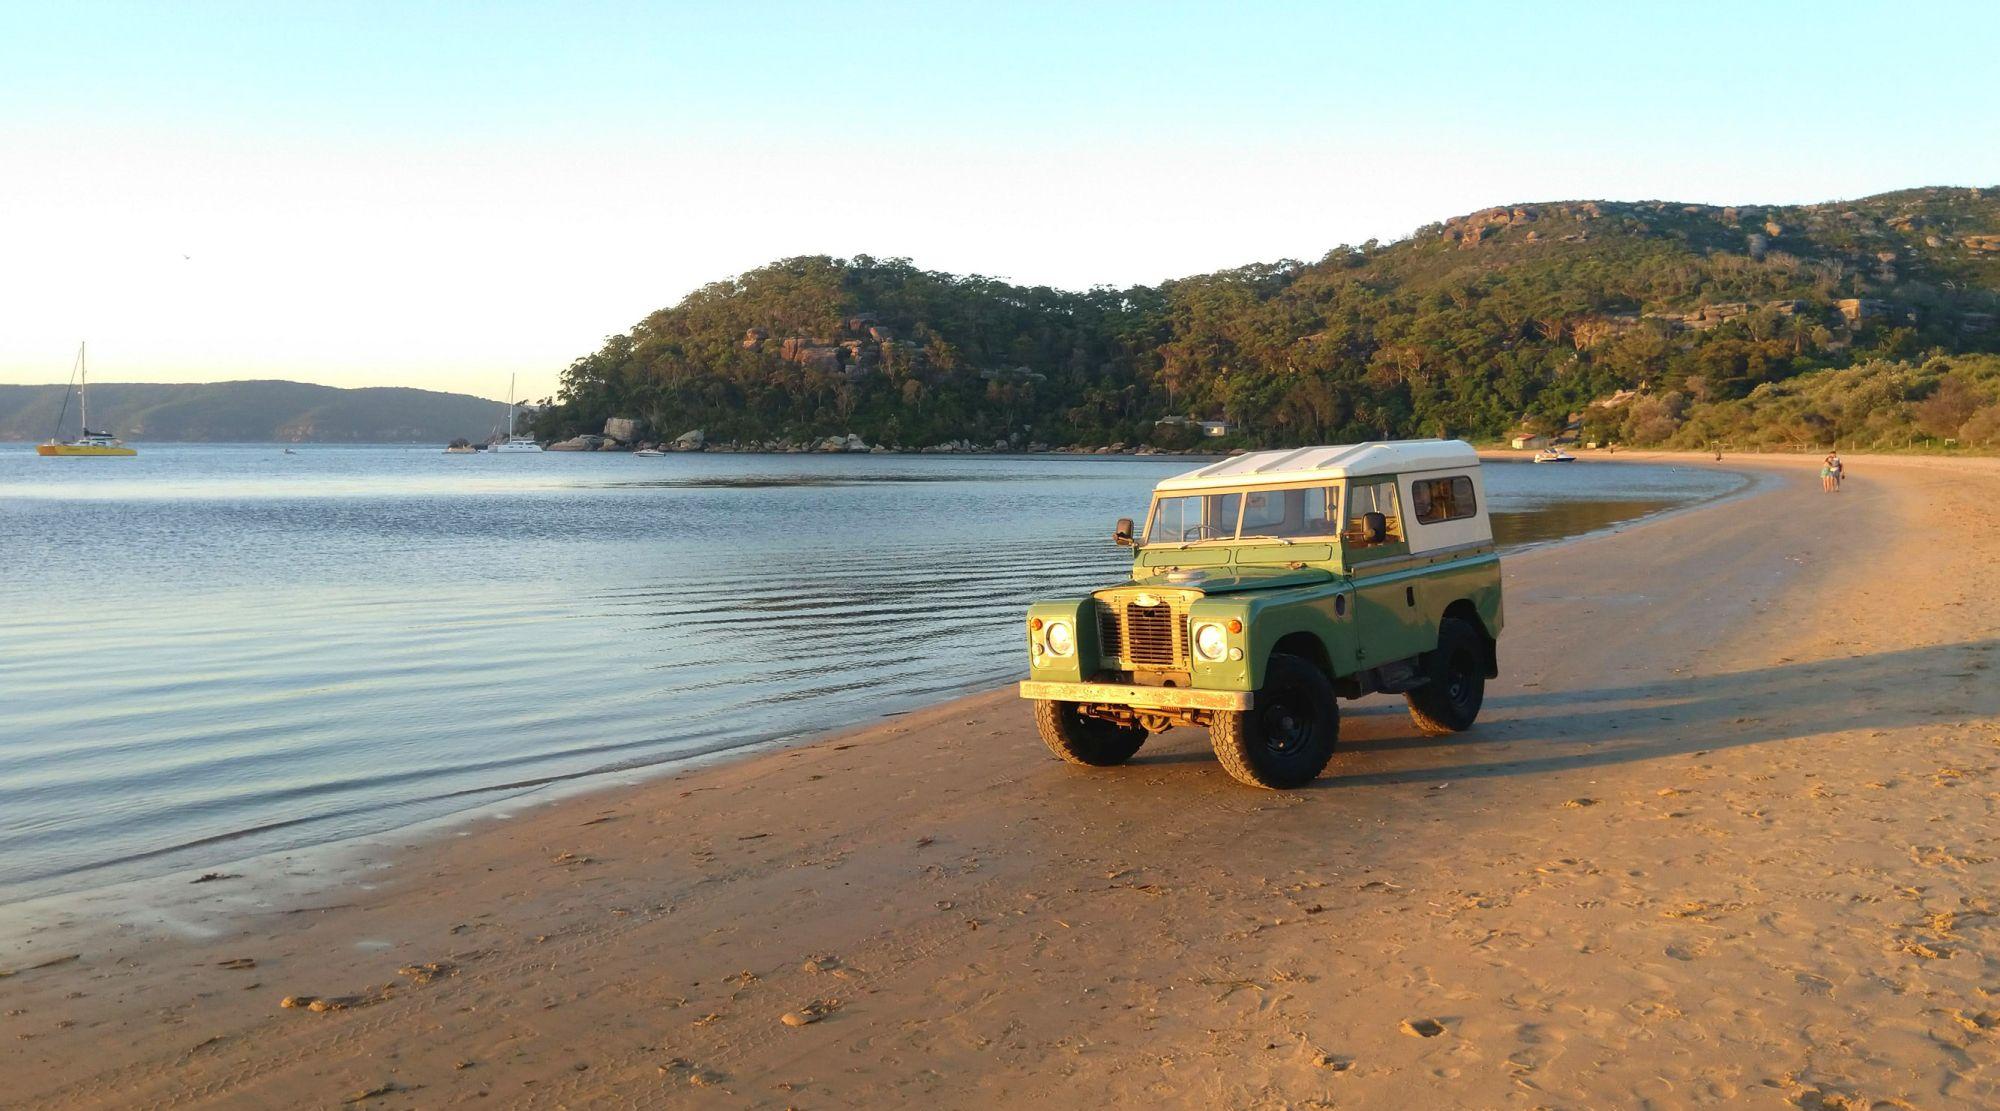 Marketing material for Jaunt Motors electric vehicle in Australia